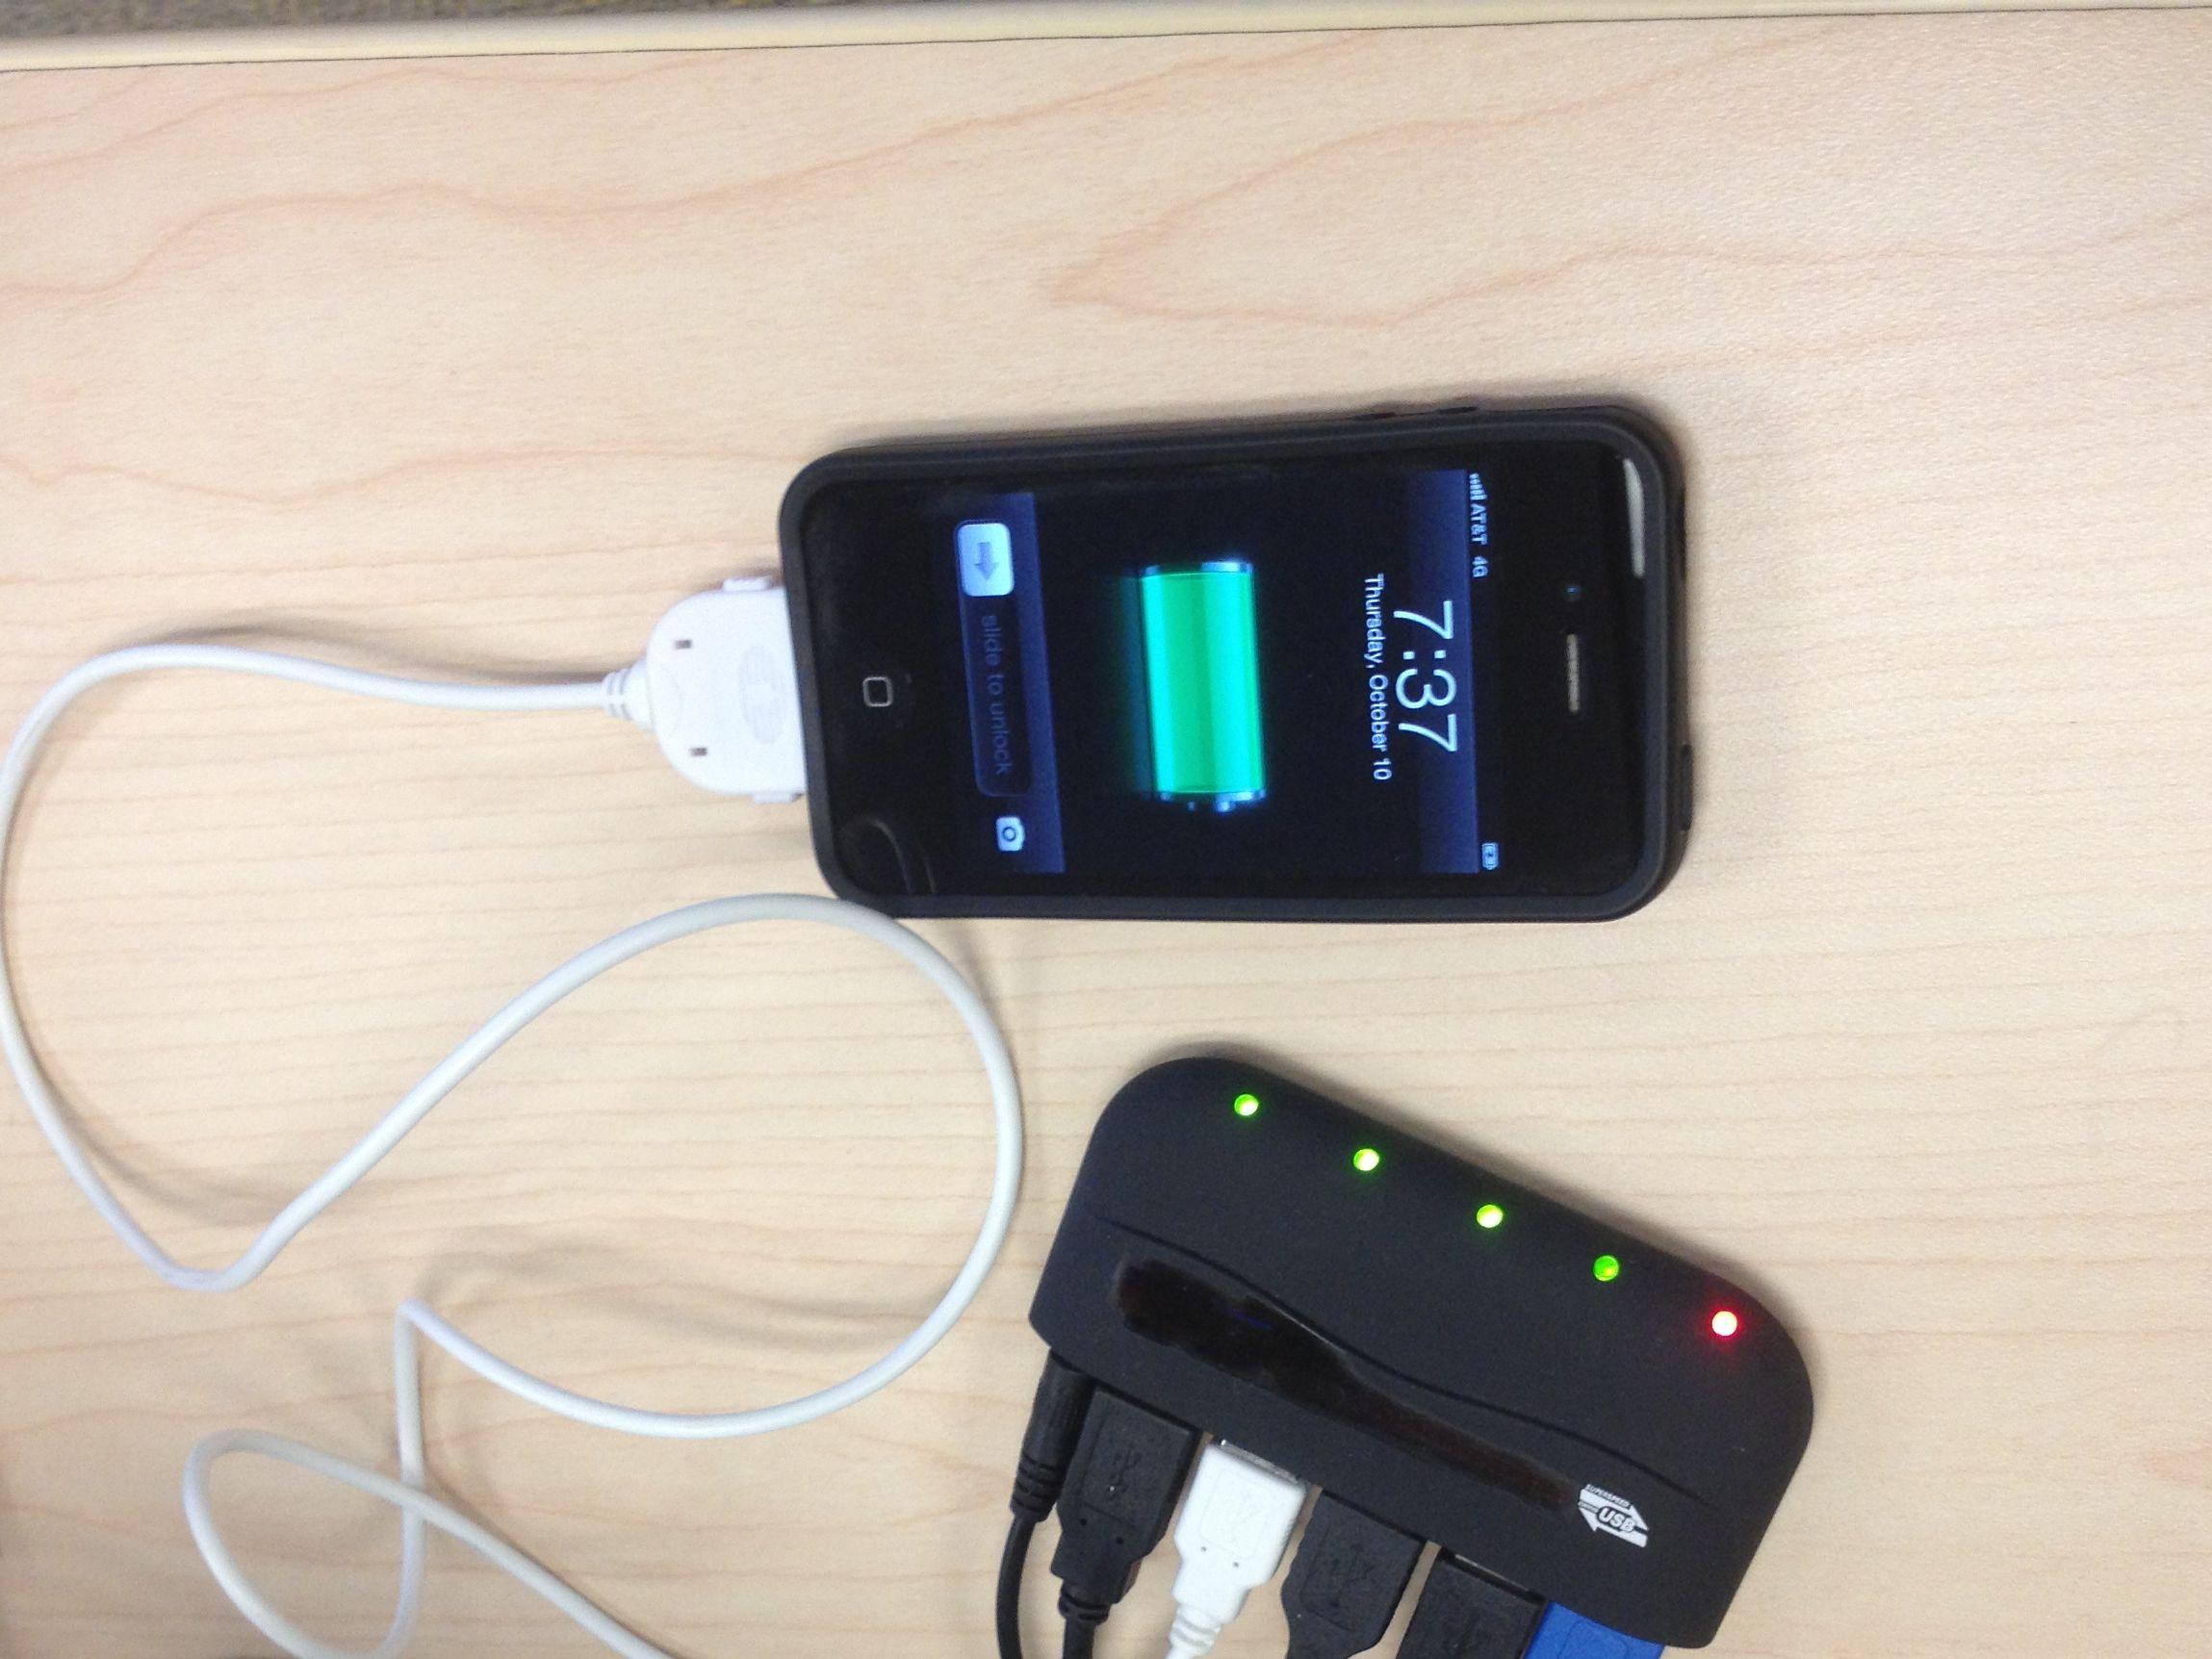 Apple iPhone Charging via USB hub - Flickr - Photo Sharing!